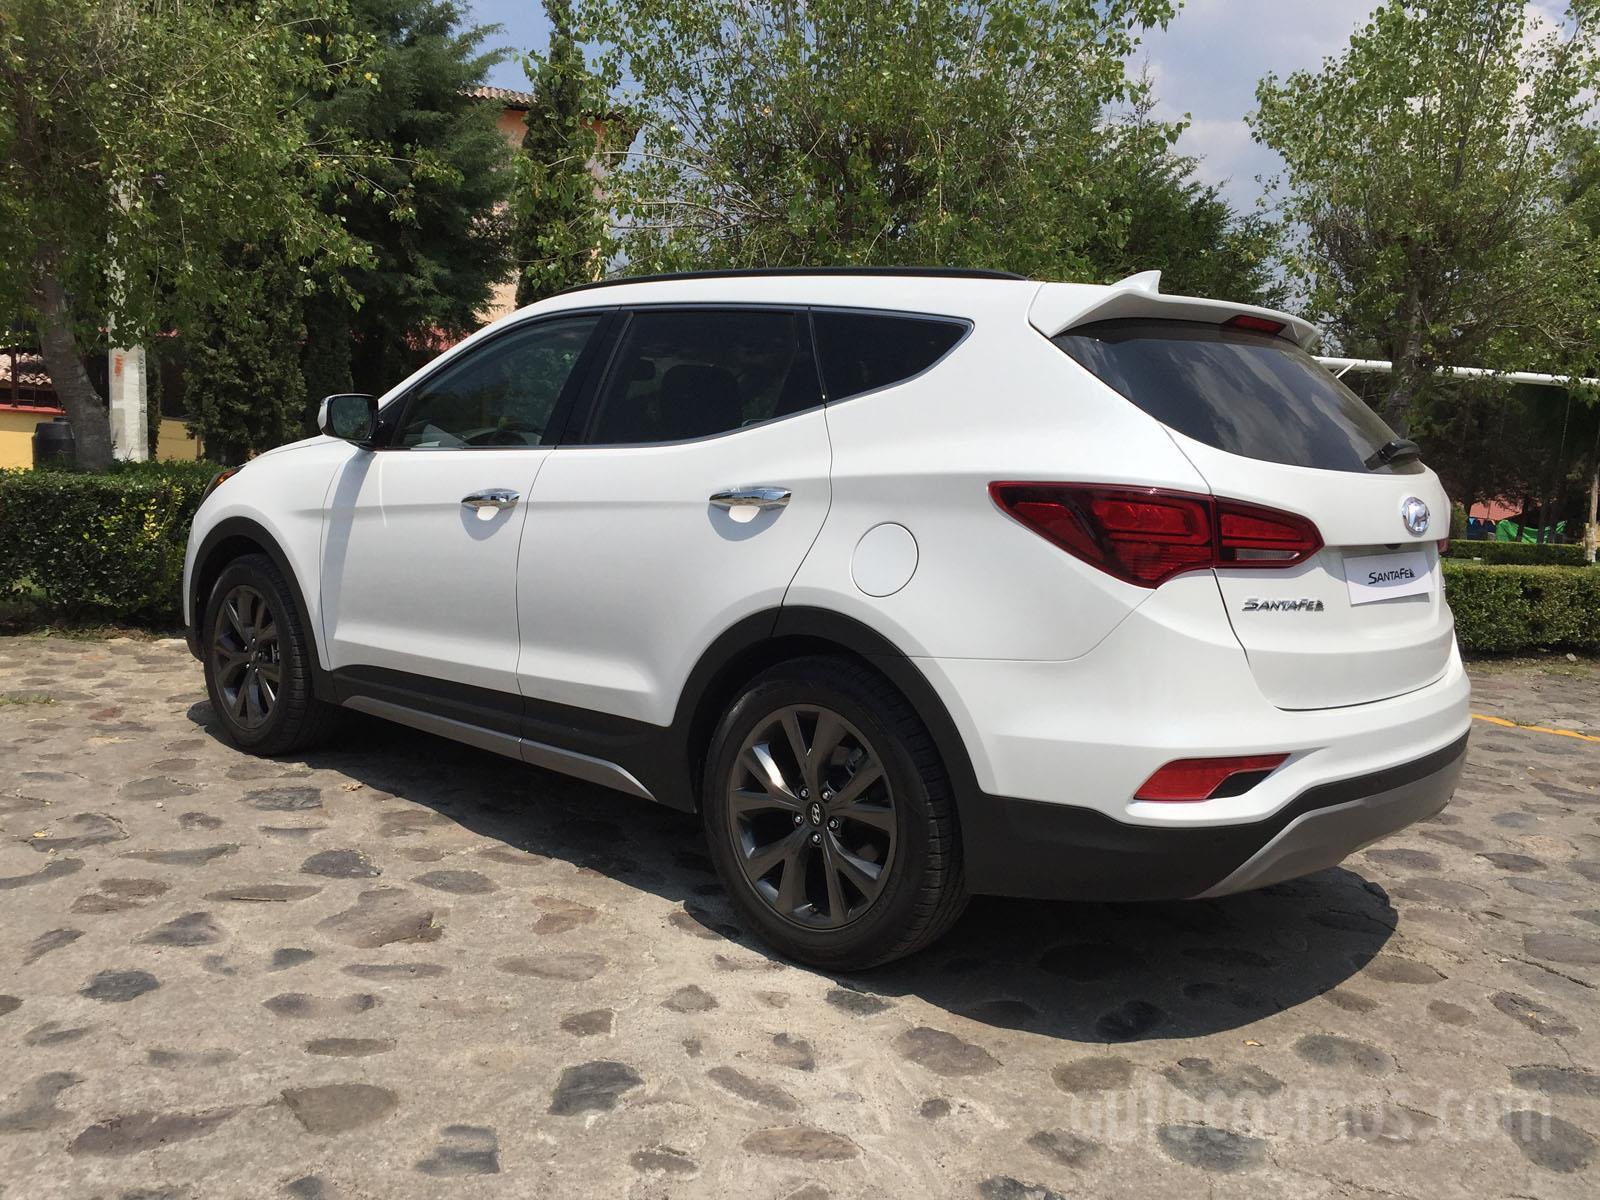 Hyundai Santa Fe 2017 Llega A M 233 Xico En 504 900 Pesos